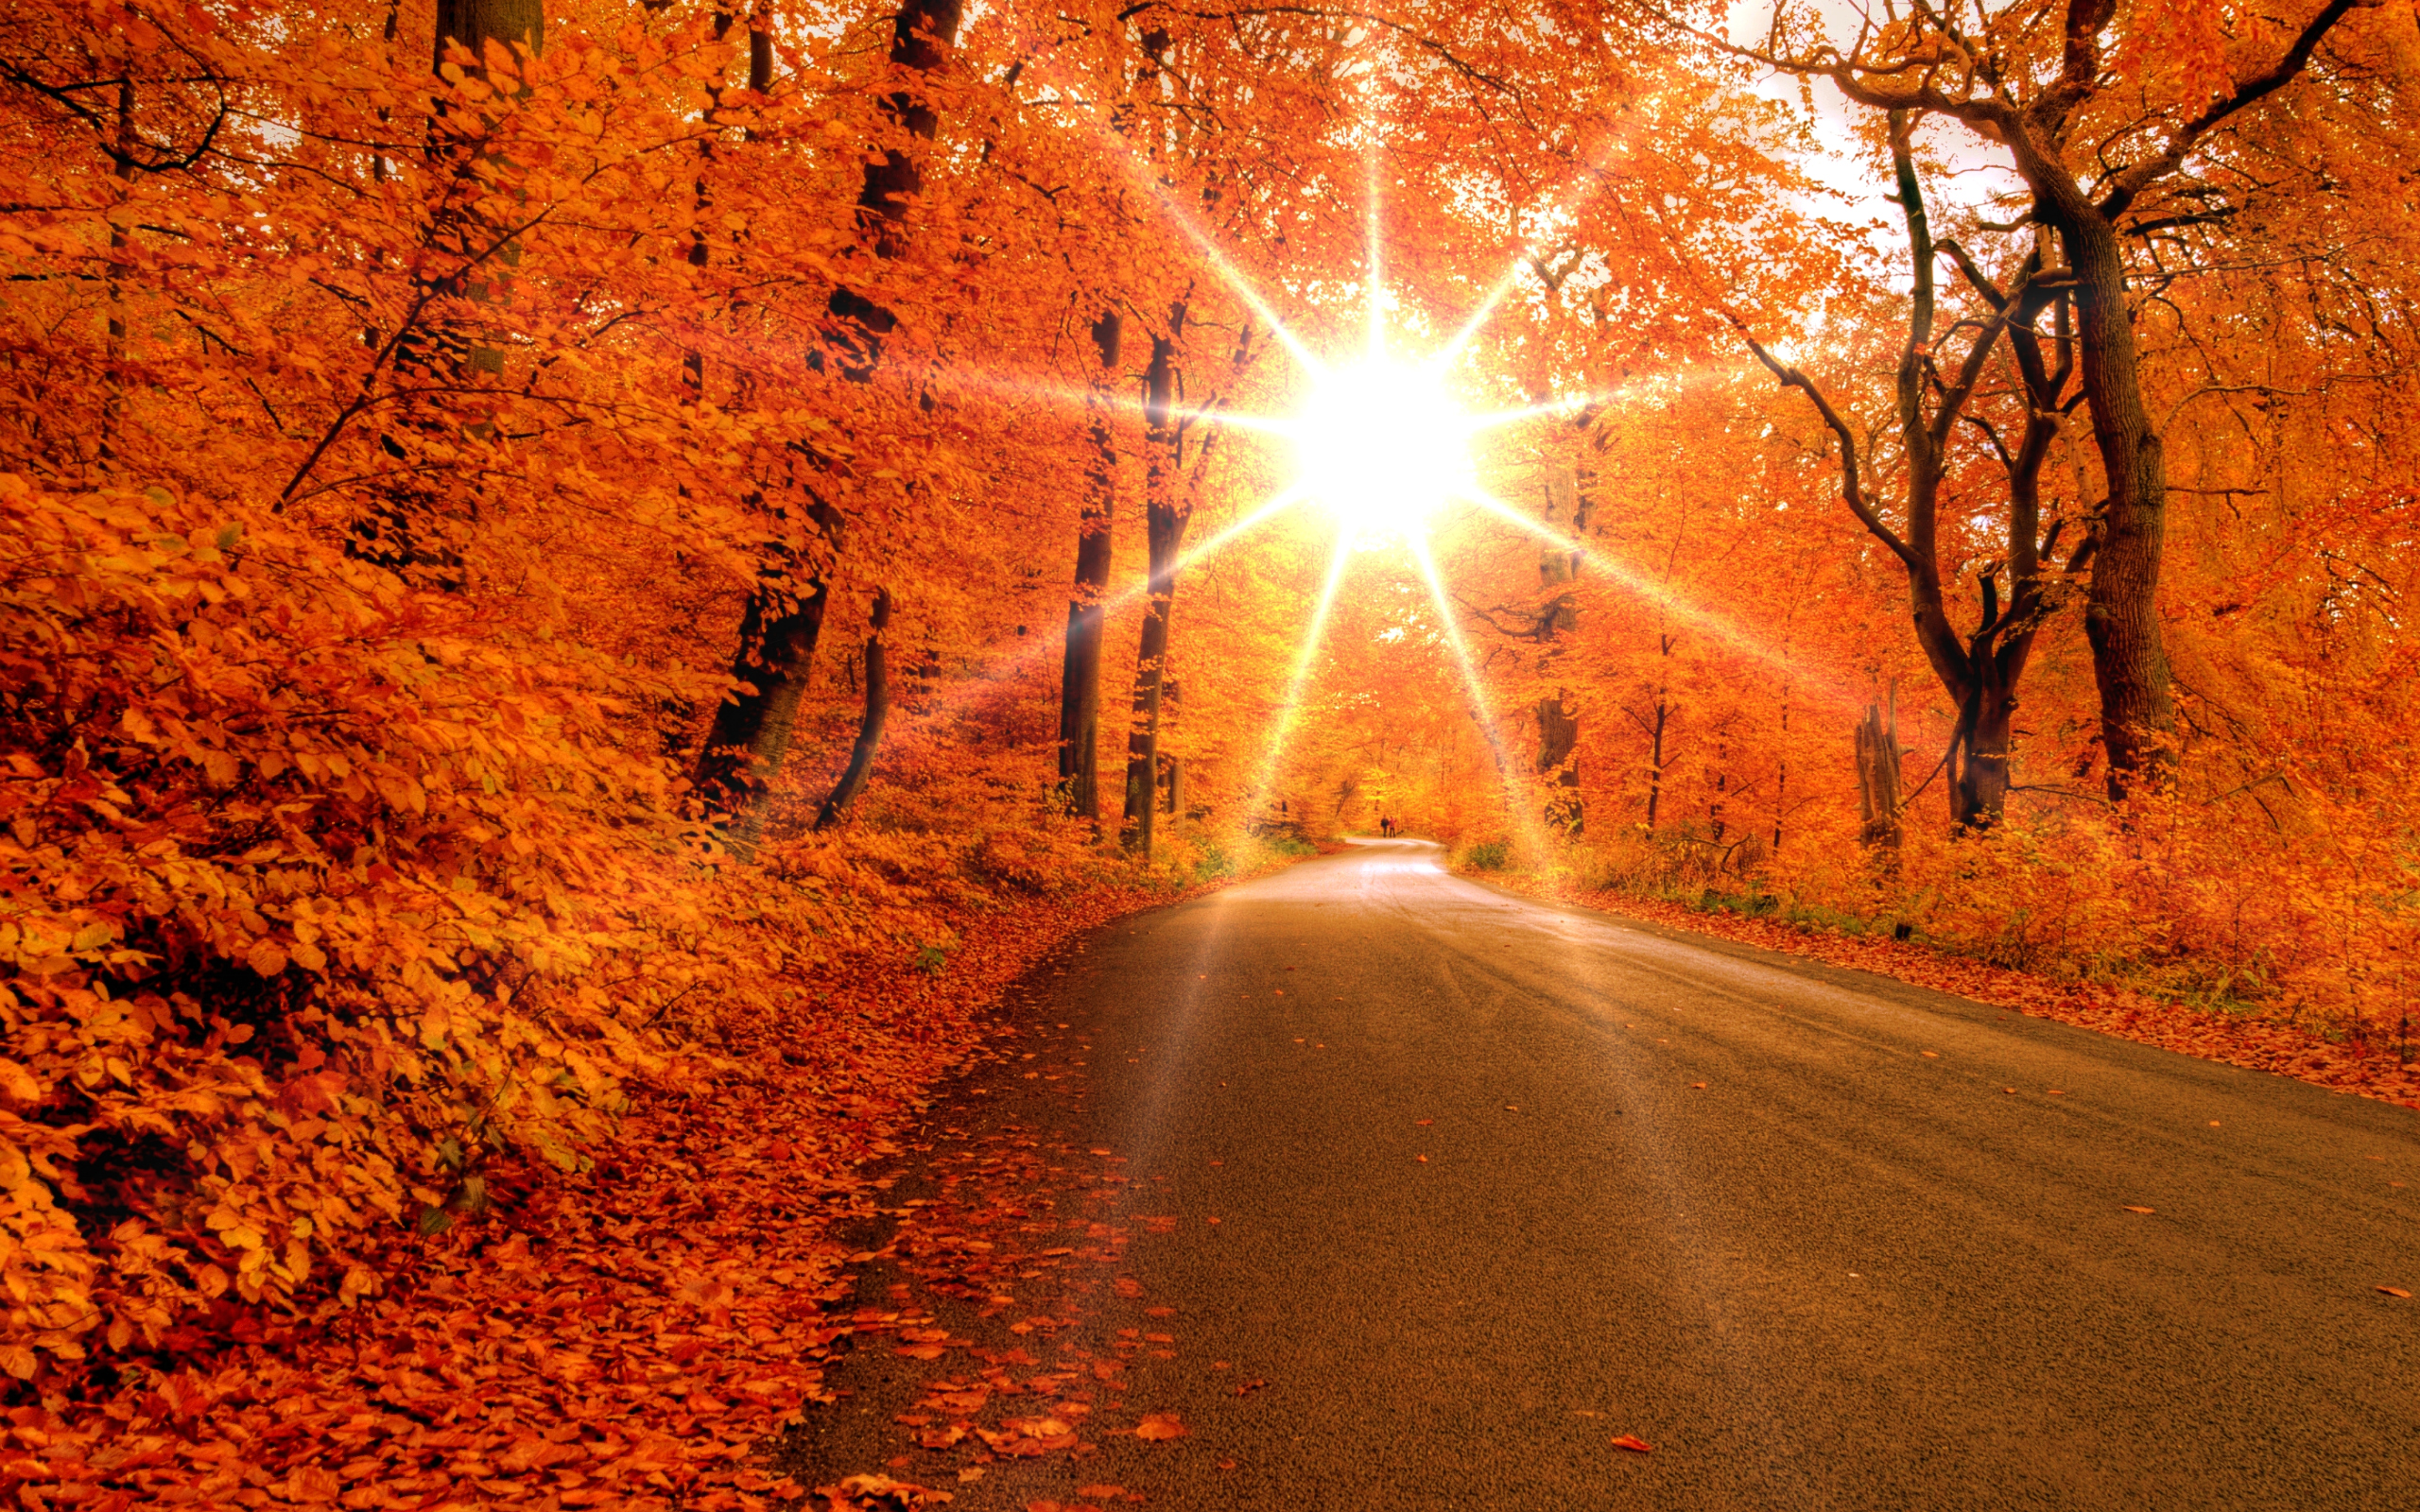 Autumn road wallpapers Autumn road stock photos 2560x1600